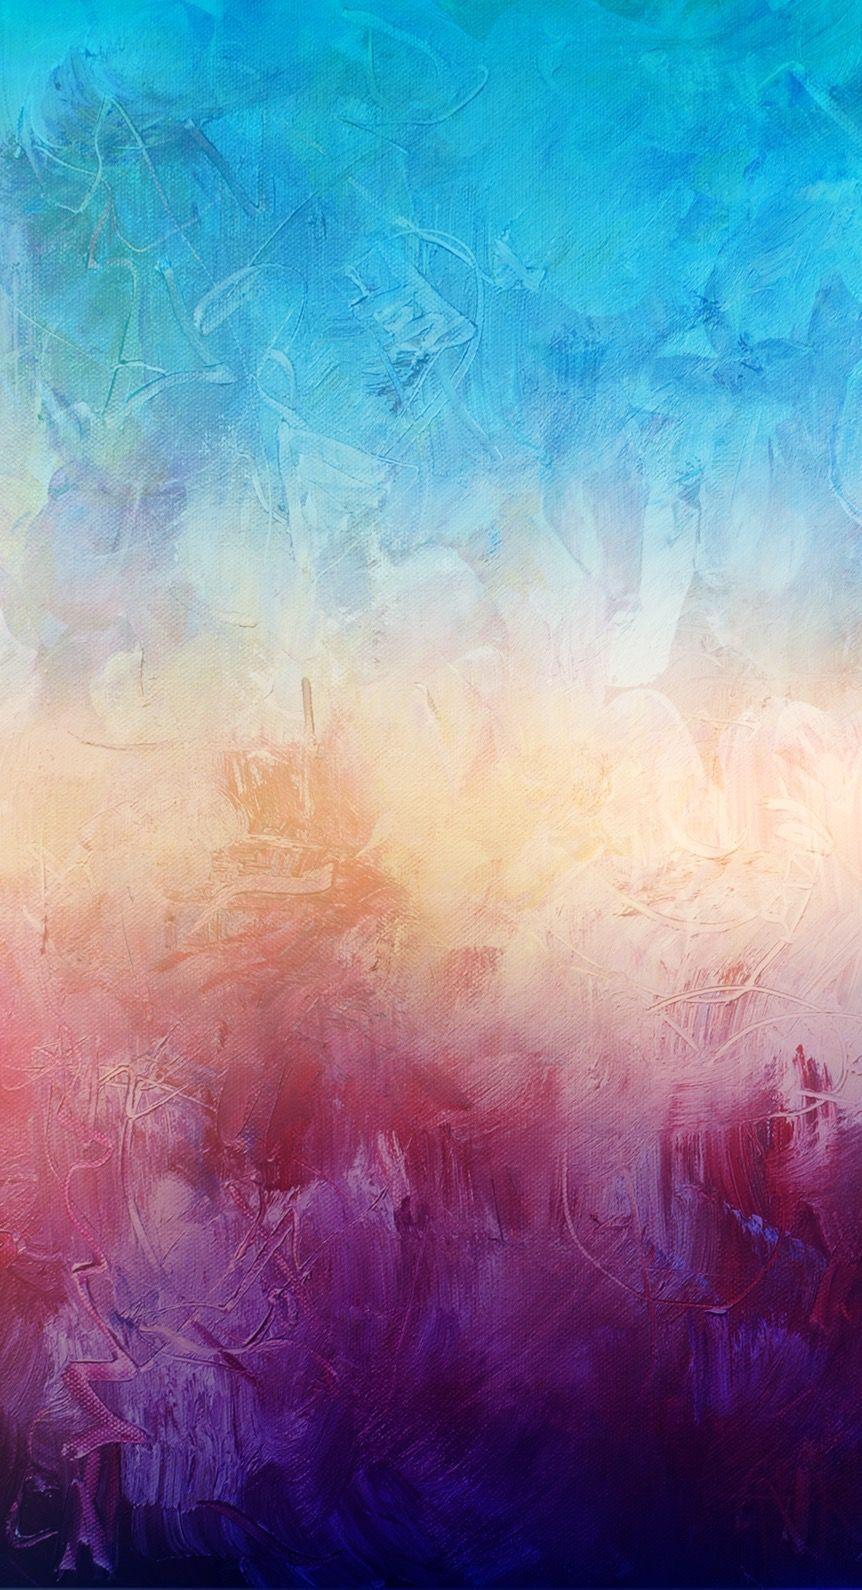 tumblr wallpapers top free